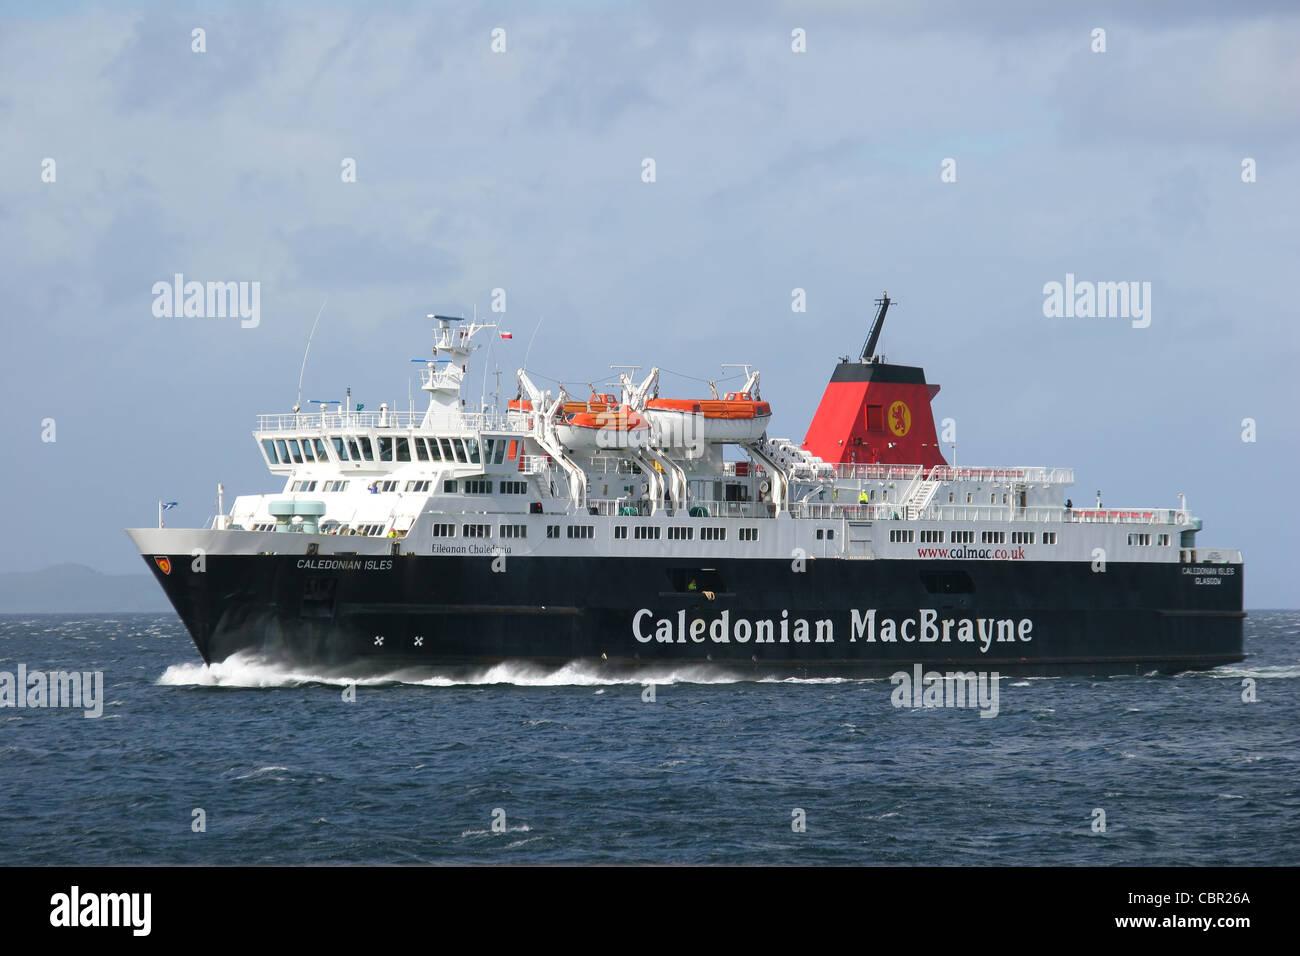 Mv Caledonian Isles approaching Brodick Bay on The Isle of Arran. - Stock Image